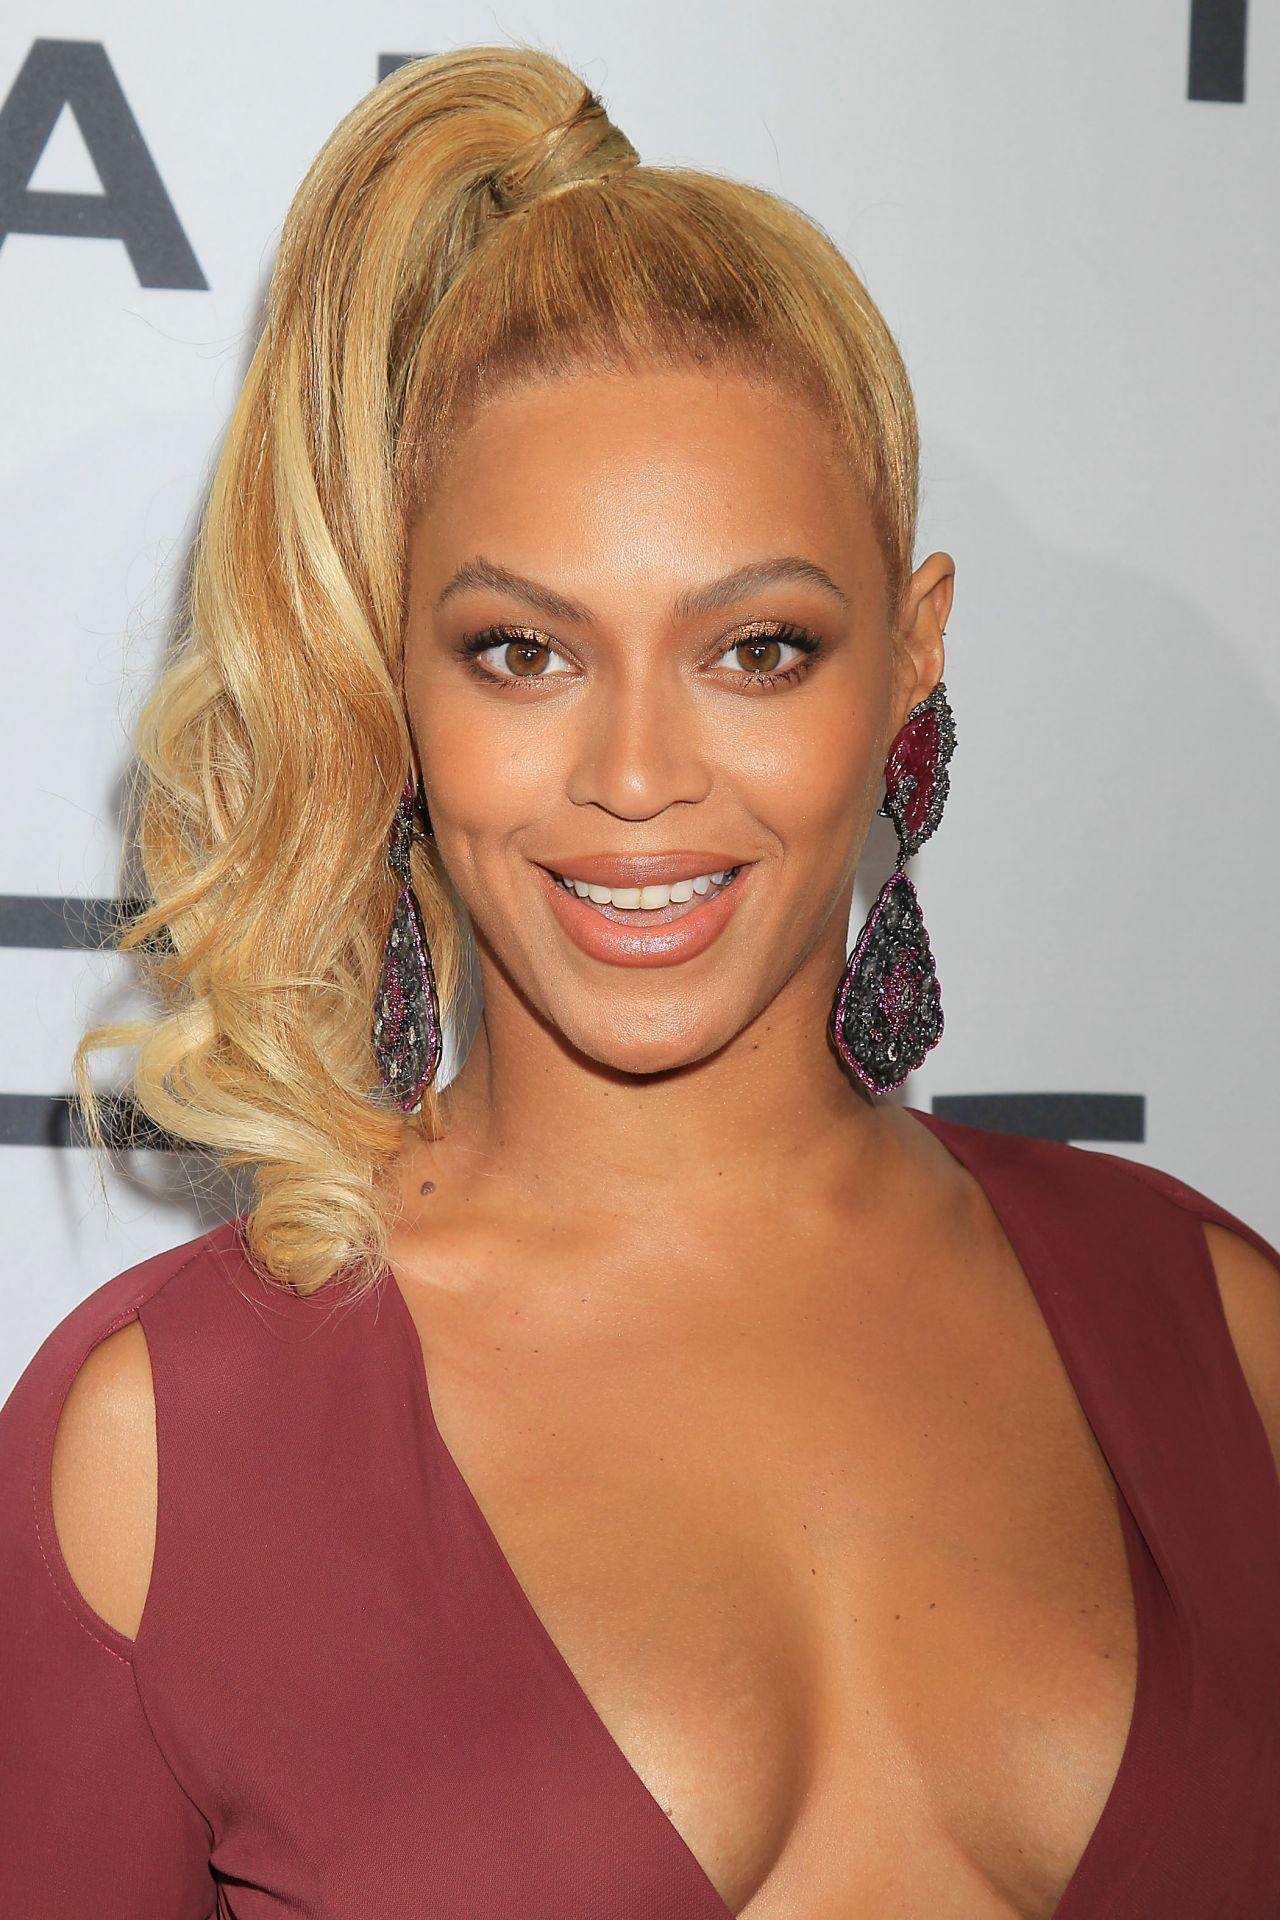 Beyonce Tidal X 1020 Amplified By Htc In Brooklyn